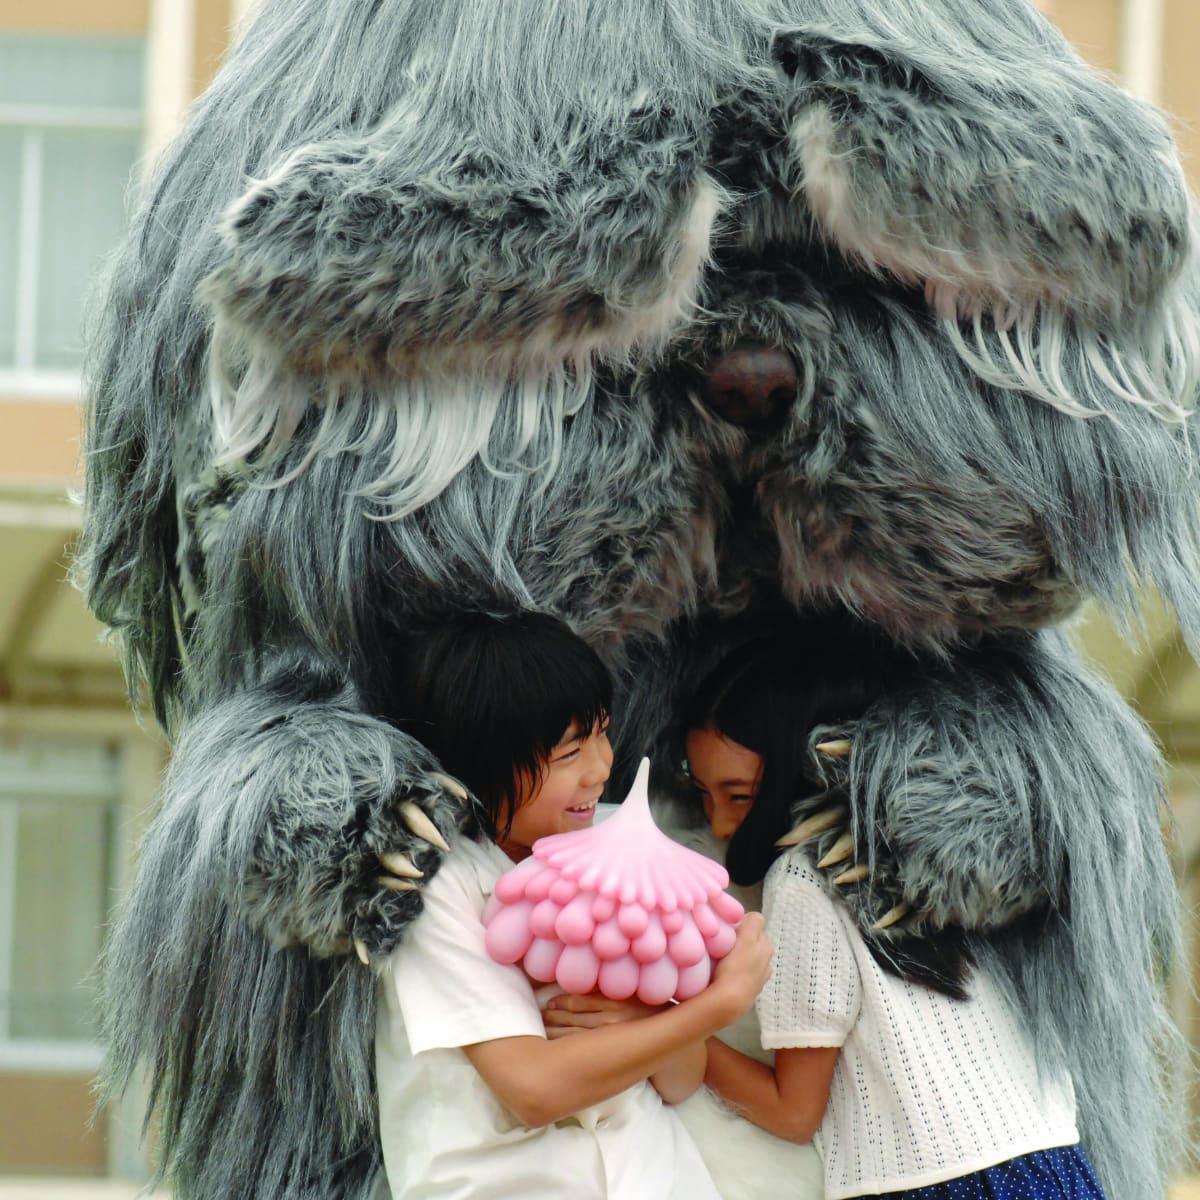 Jellyfish Eyes by Takashi Murakami